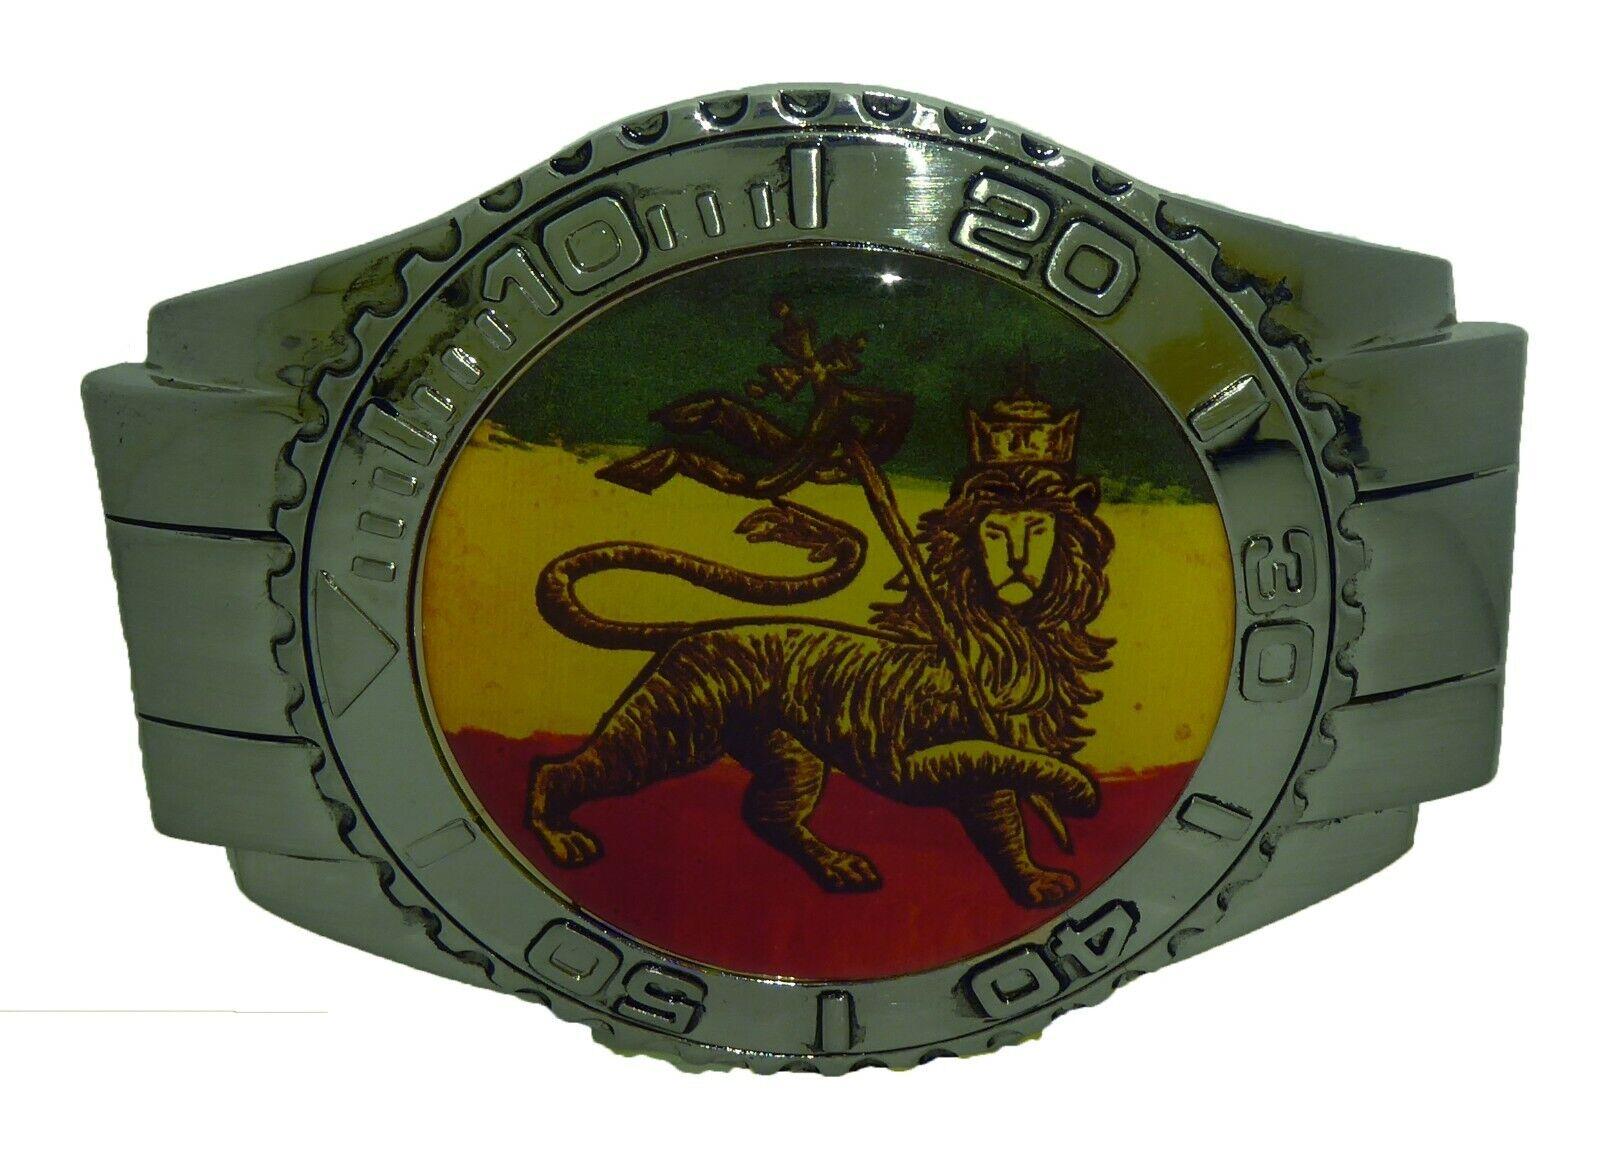 Rastafarian belt buckle Weed Cannabis Selassie Marley Jamaica Roots Gangsta Dub